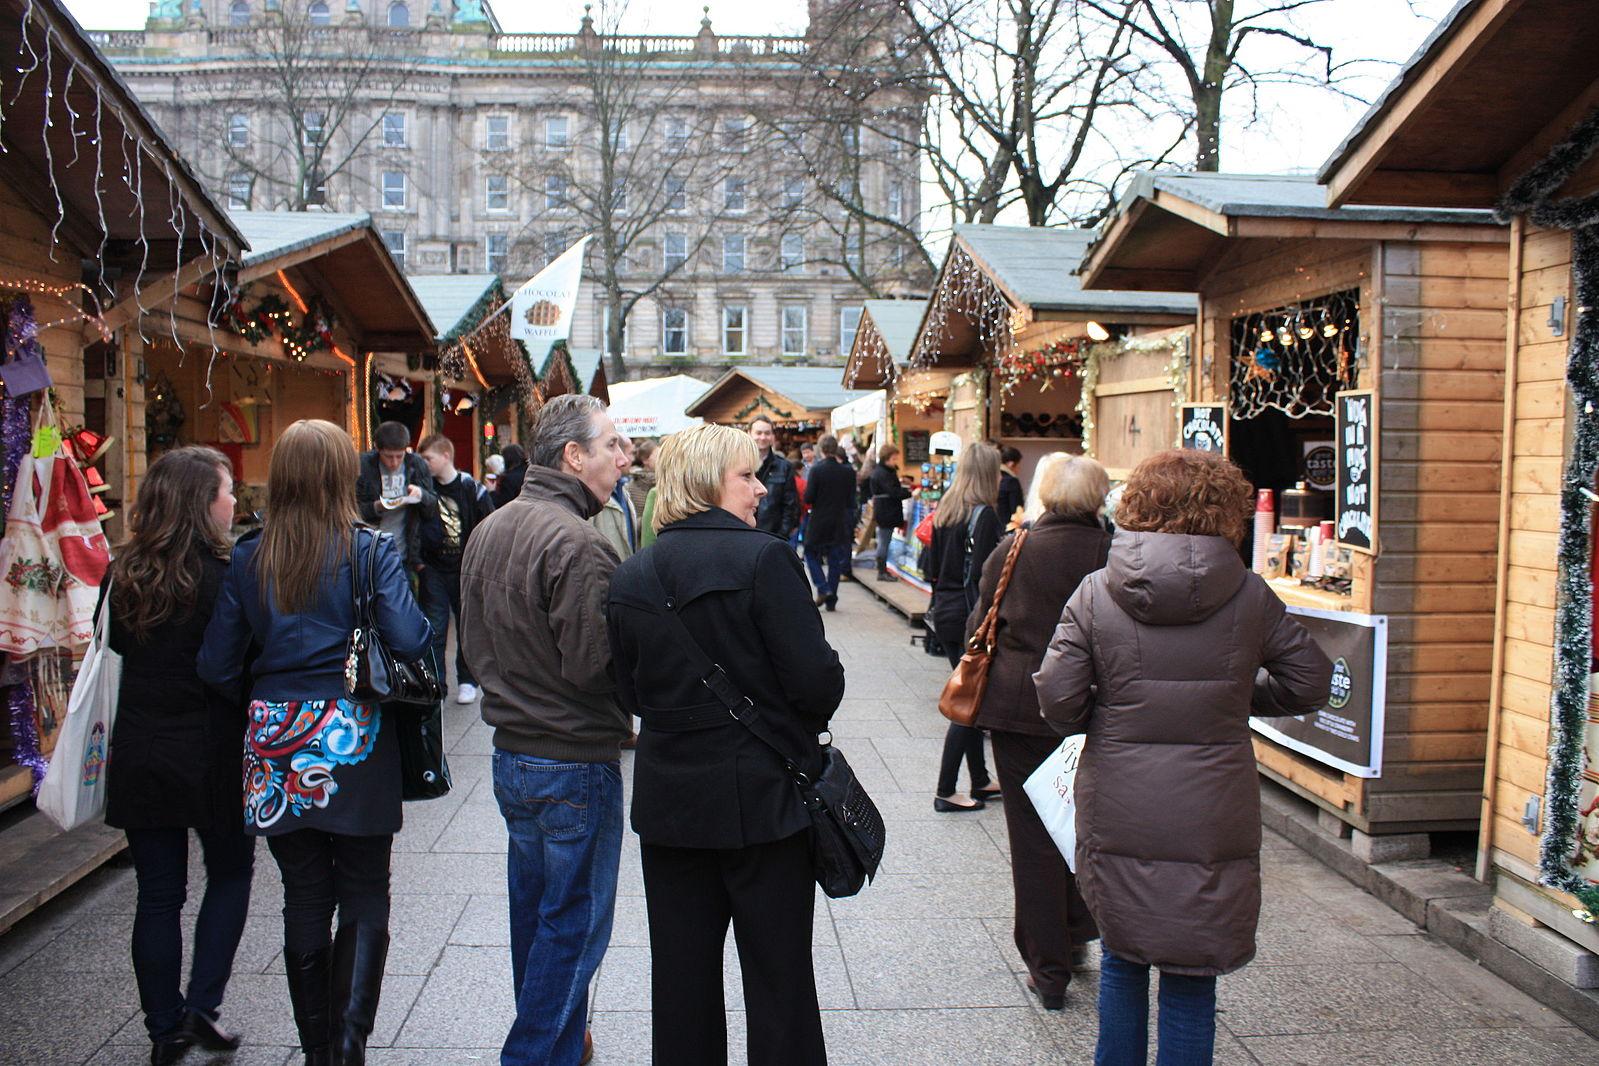 Belfast Christmas Continental Market | © Ardfern/ WikiCommons